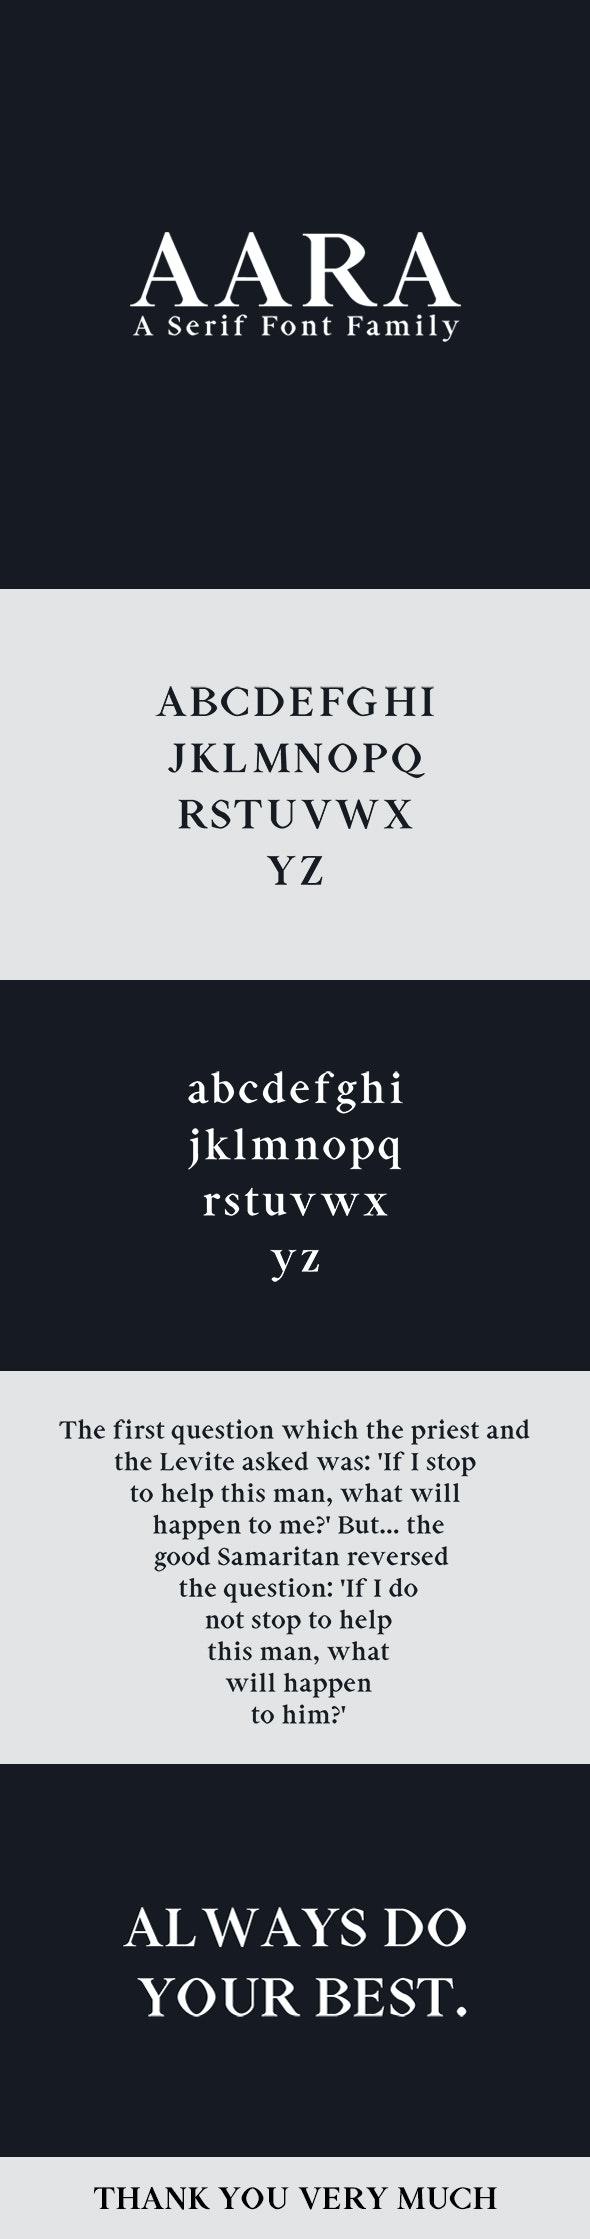 Aara Serif Font Family - Serif Fonts